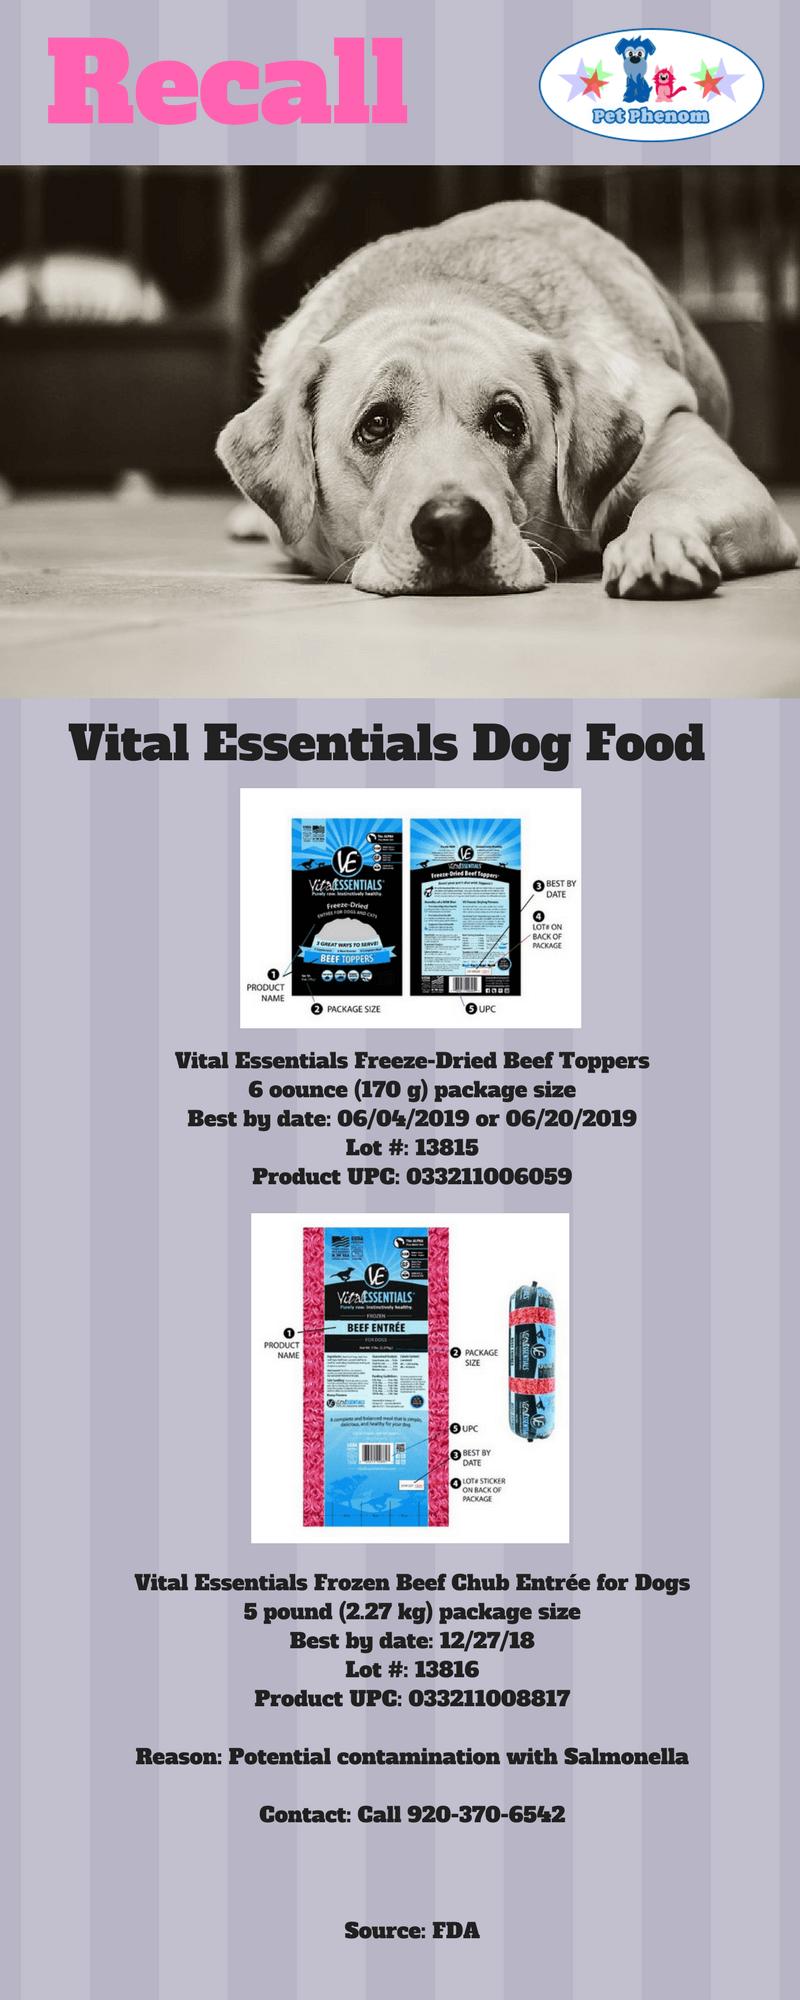 Vital Essentials Dog Food Recall Blog Pinterest Dog Food